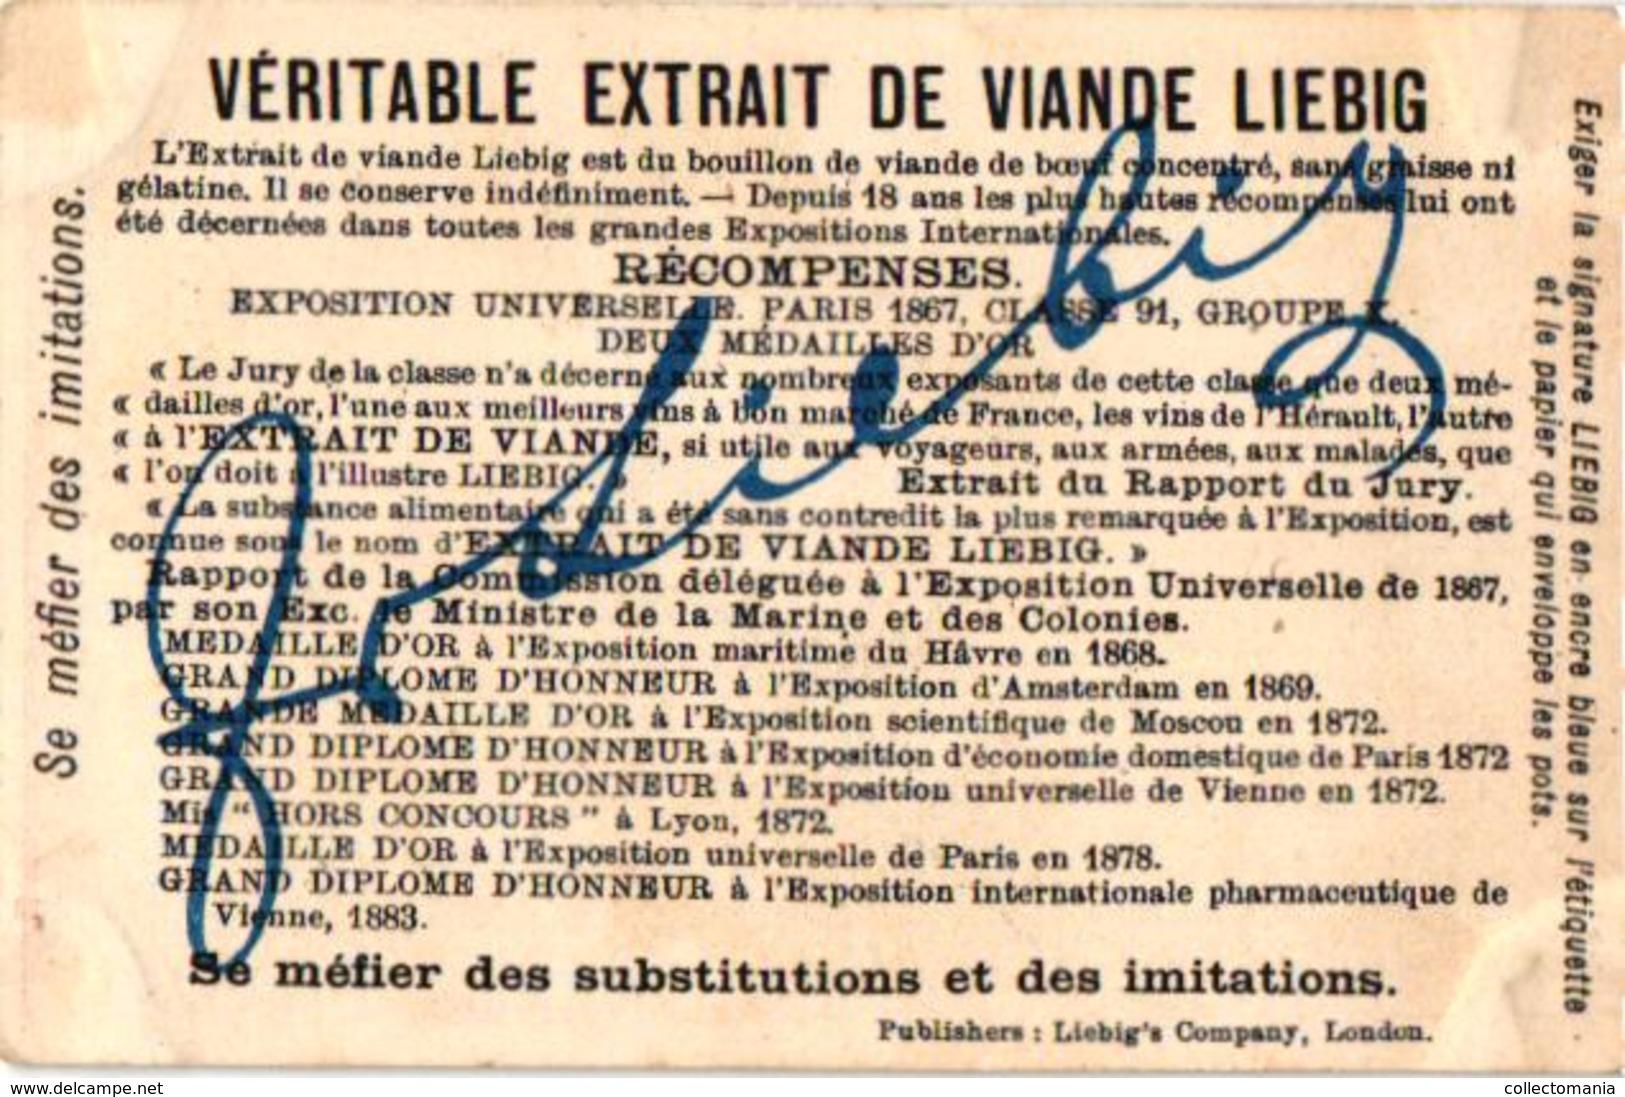 0174 Fruits Et Têtes D'enfants - LIEBIG Nr 174 Complete Set Rare,  6 Litho Chromo Cards, C1875, Children Heads - Liebig